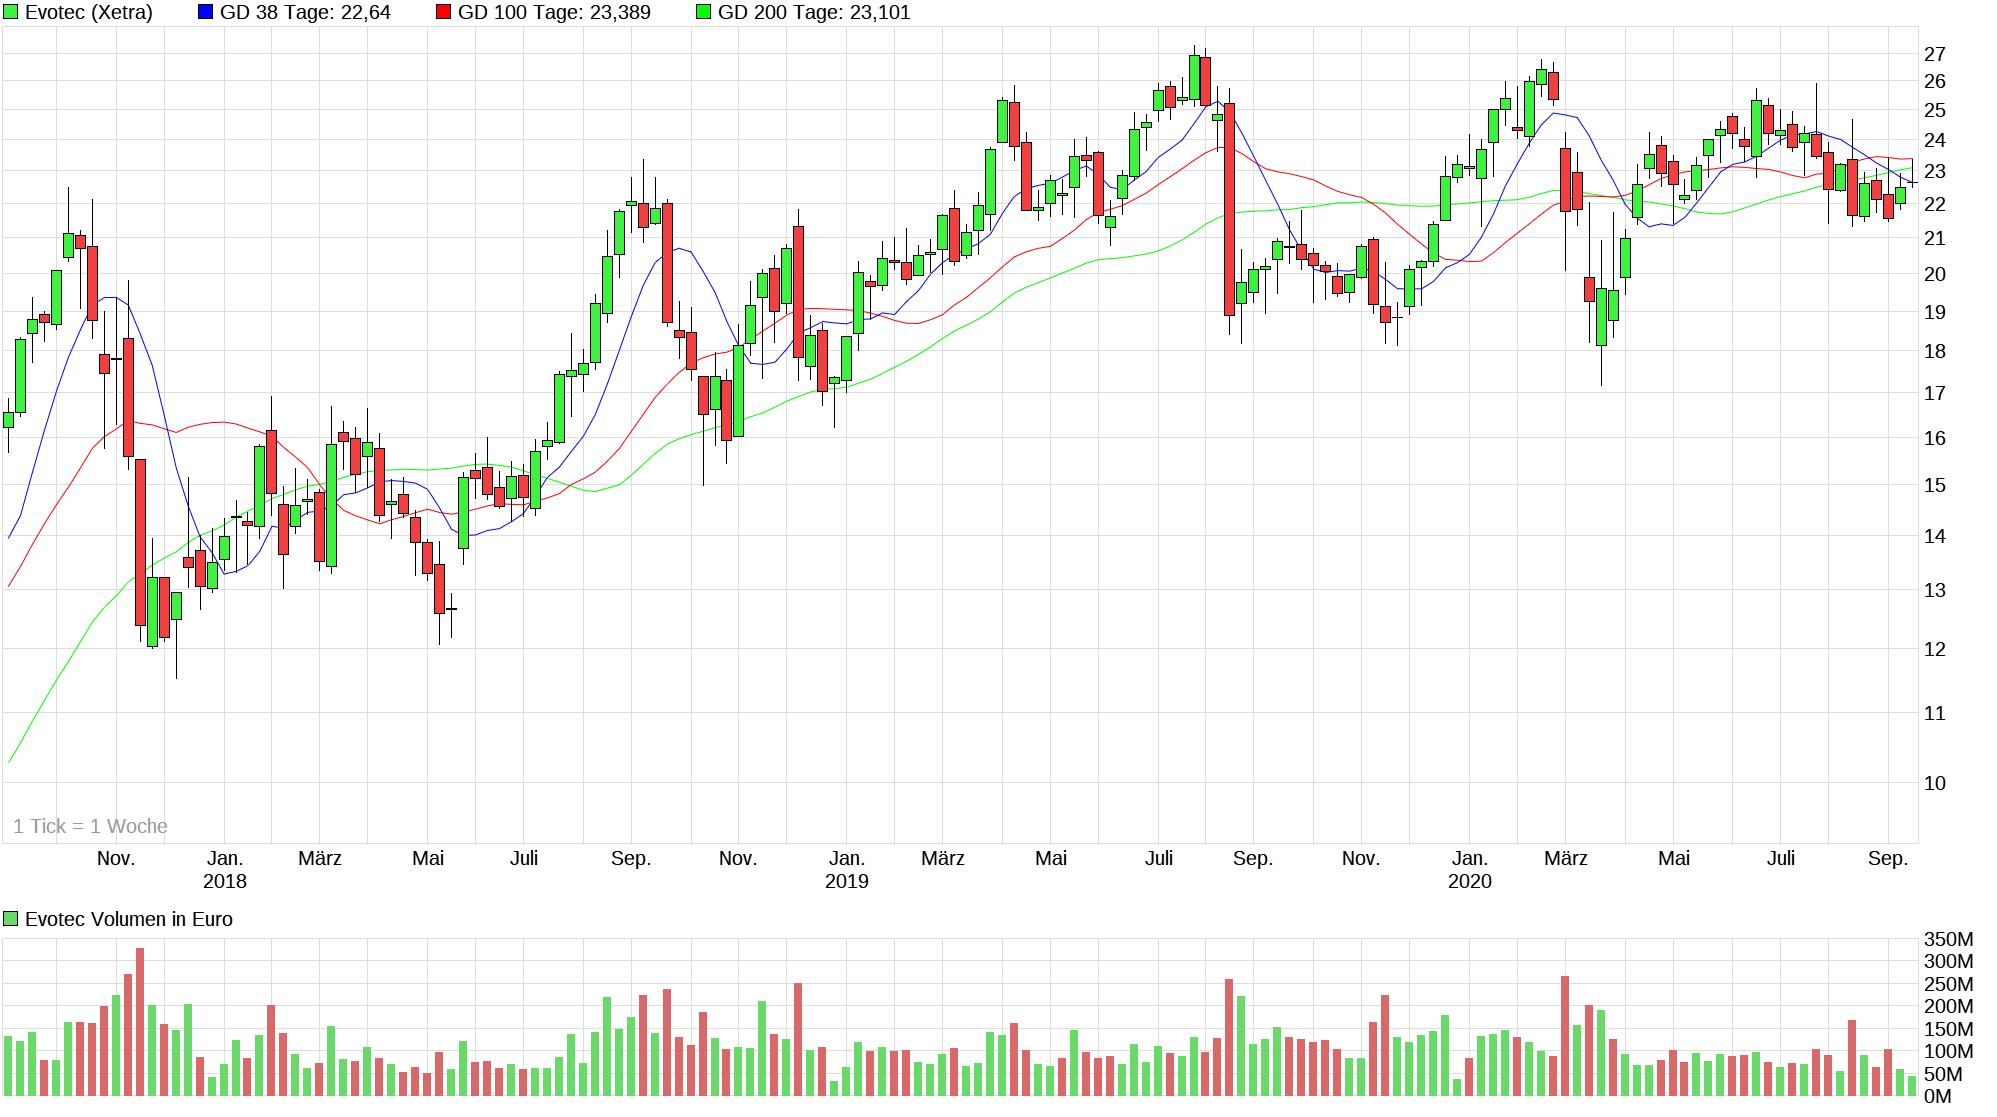 chart_3years_evotec.png